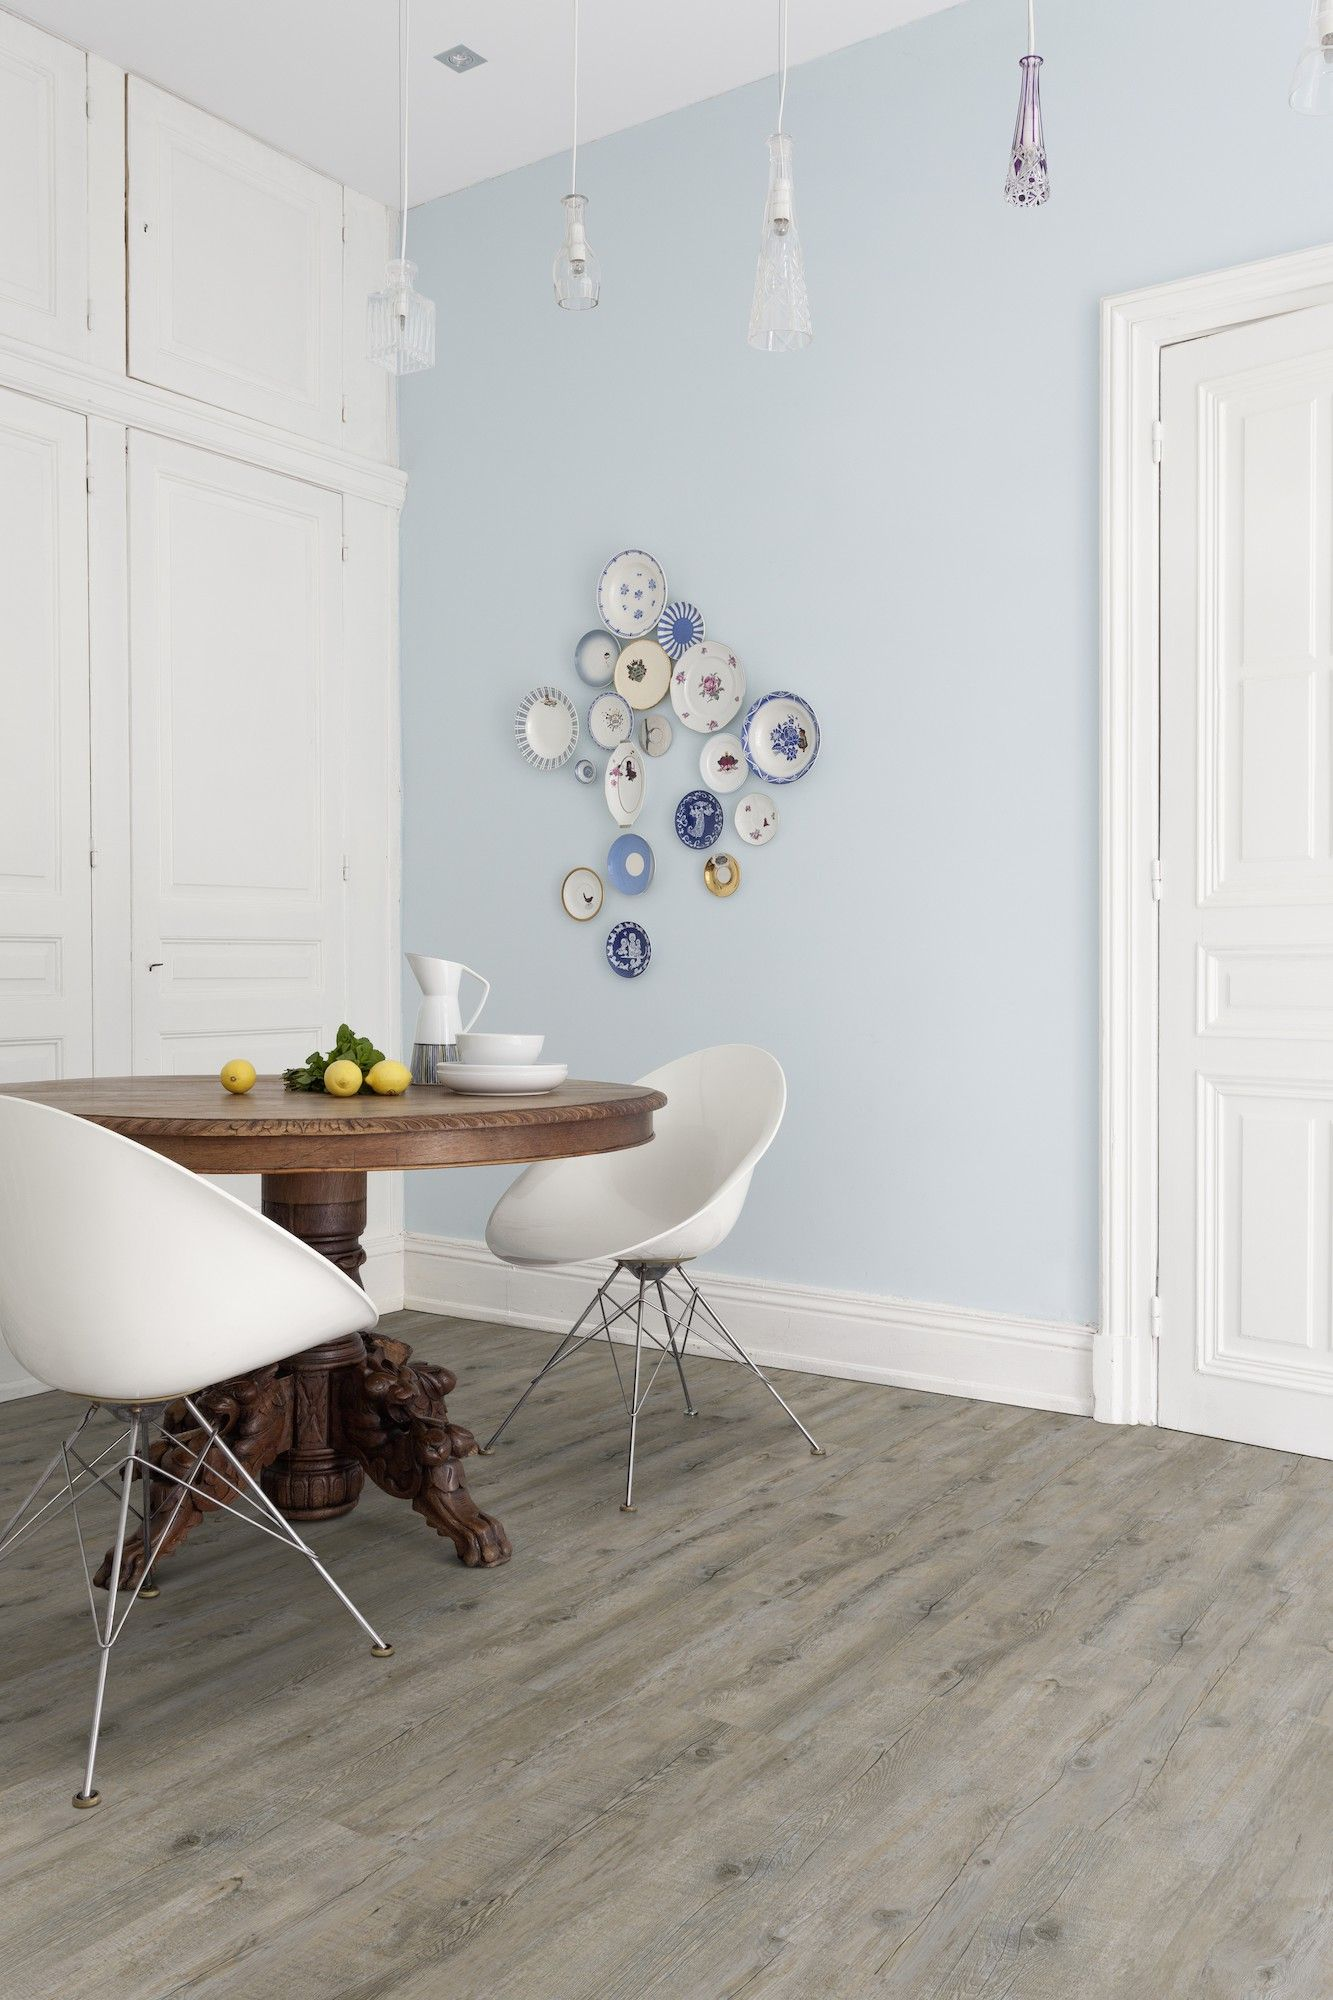 Pvc vloer met houtlook. Grey pecan XL (Limited edition) Zelfklevende ...